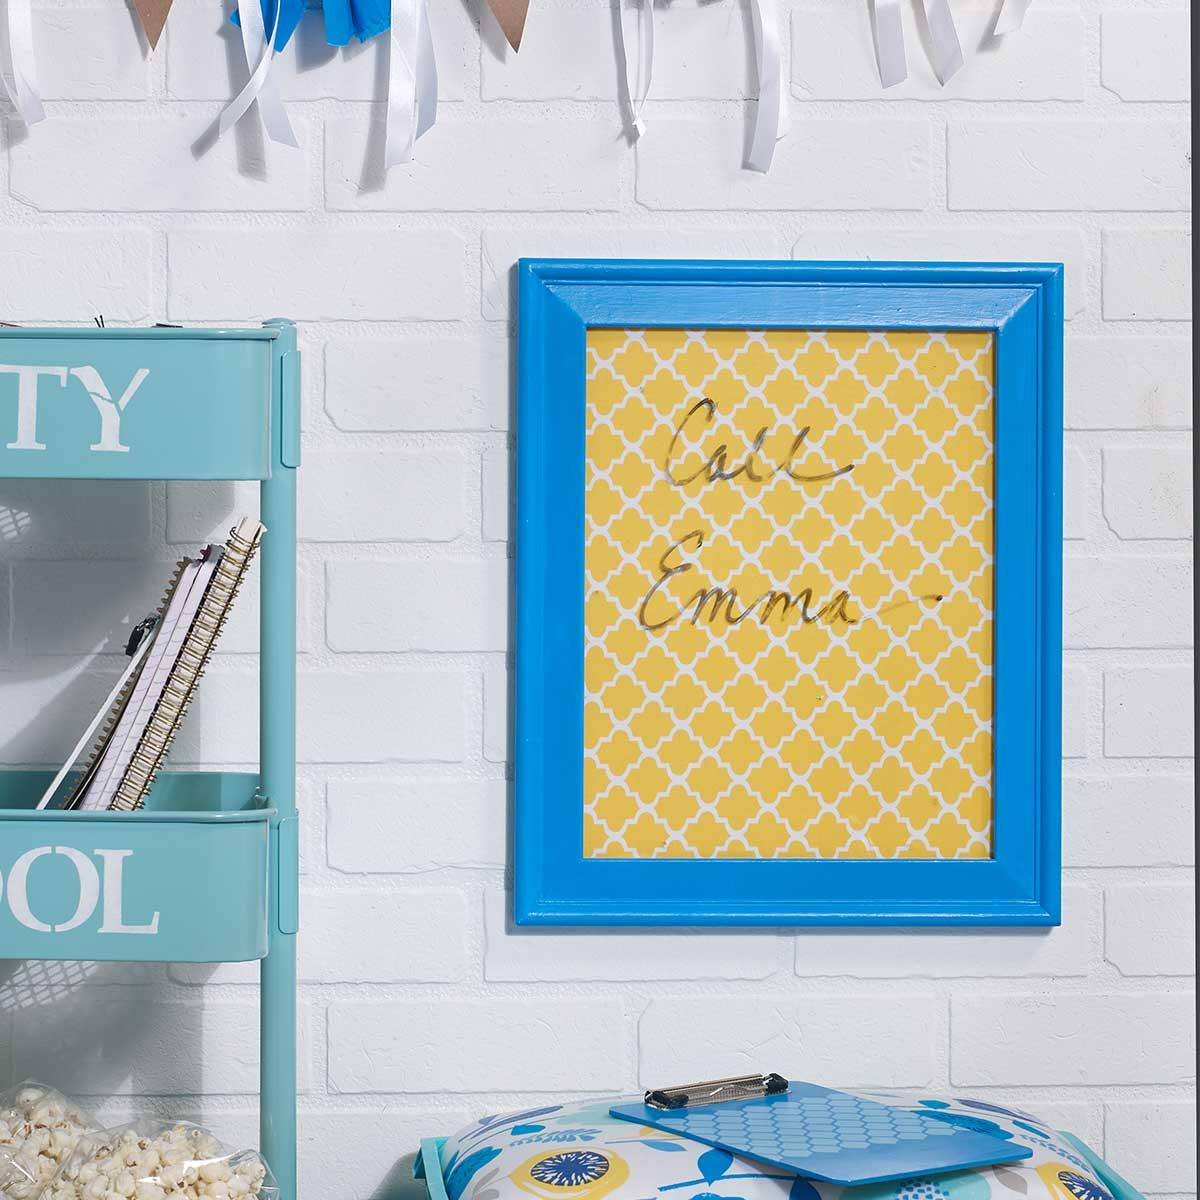 Customized Dry Erase Board Dorm Decorating Idea